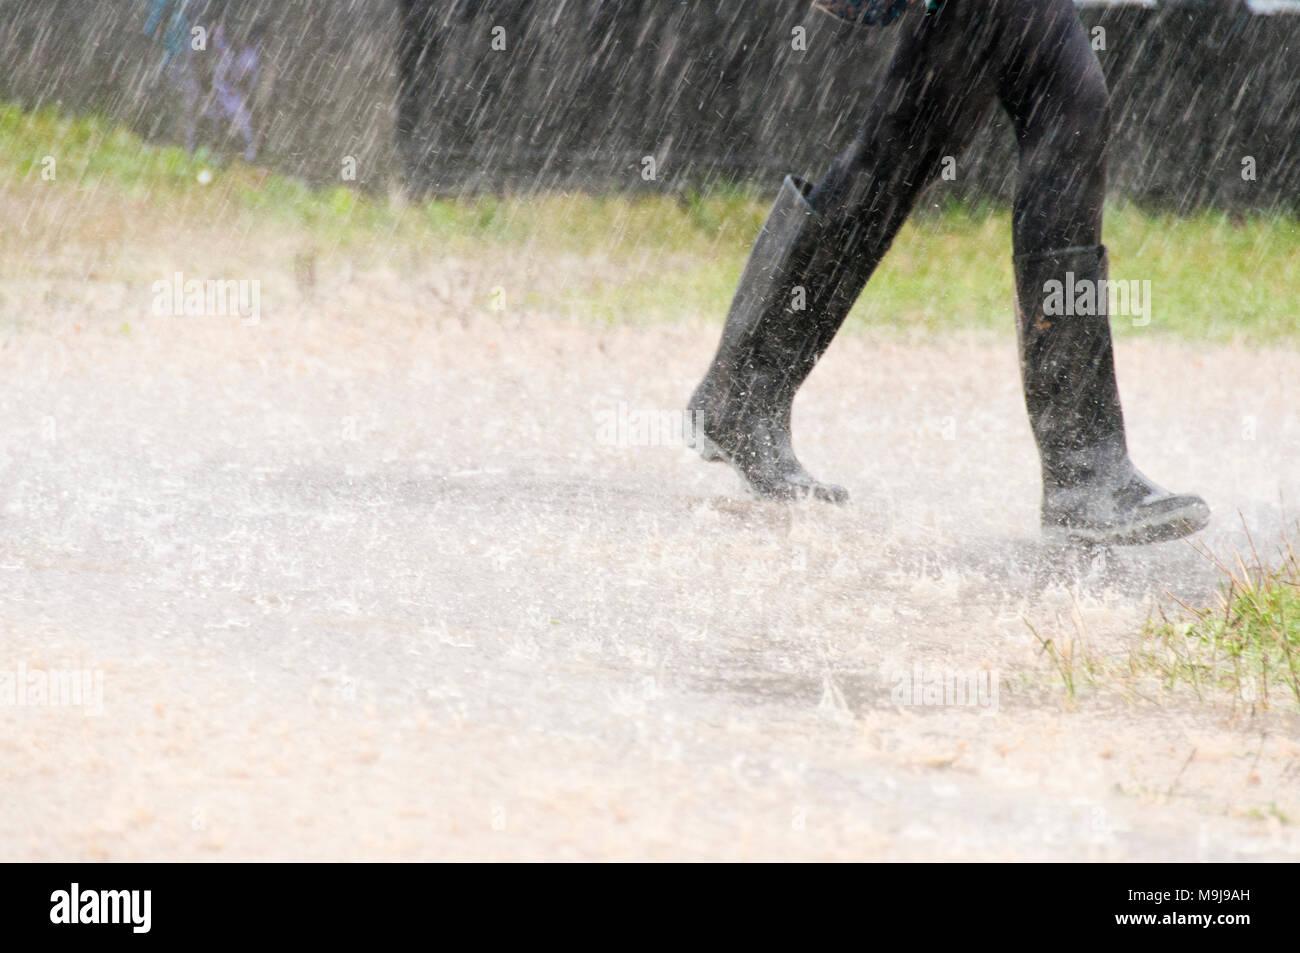 Wellies in the rain - Stock Image